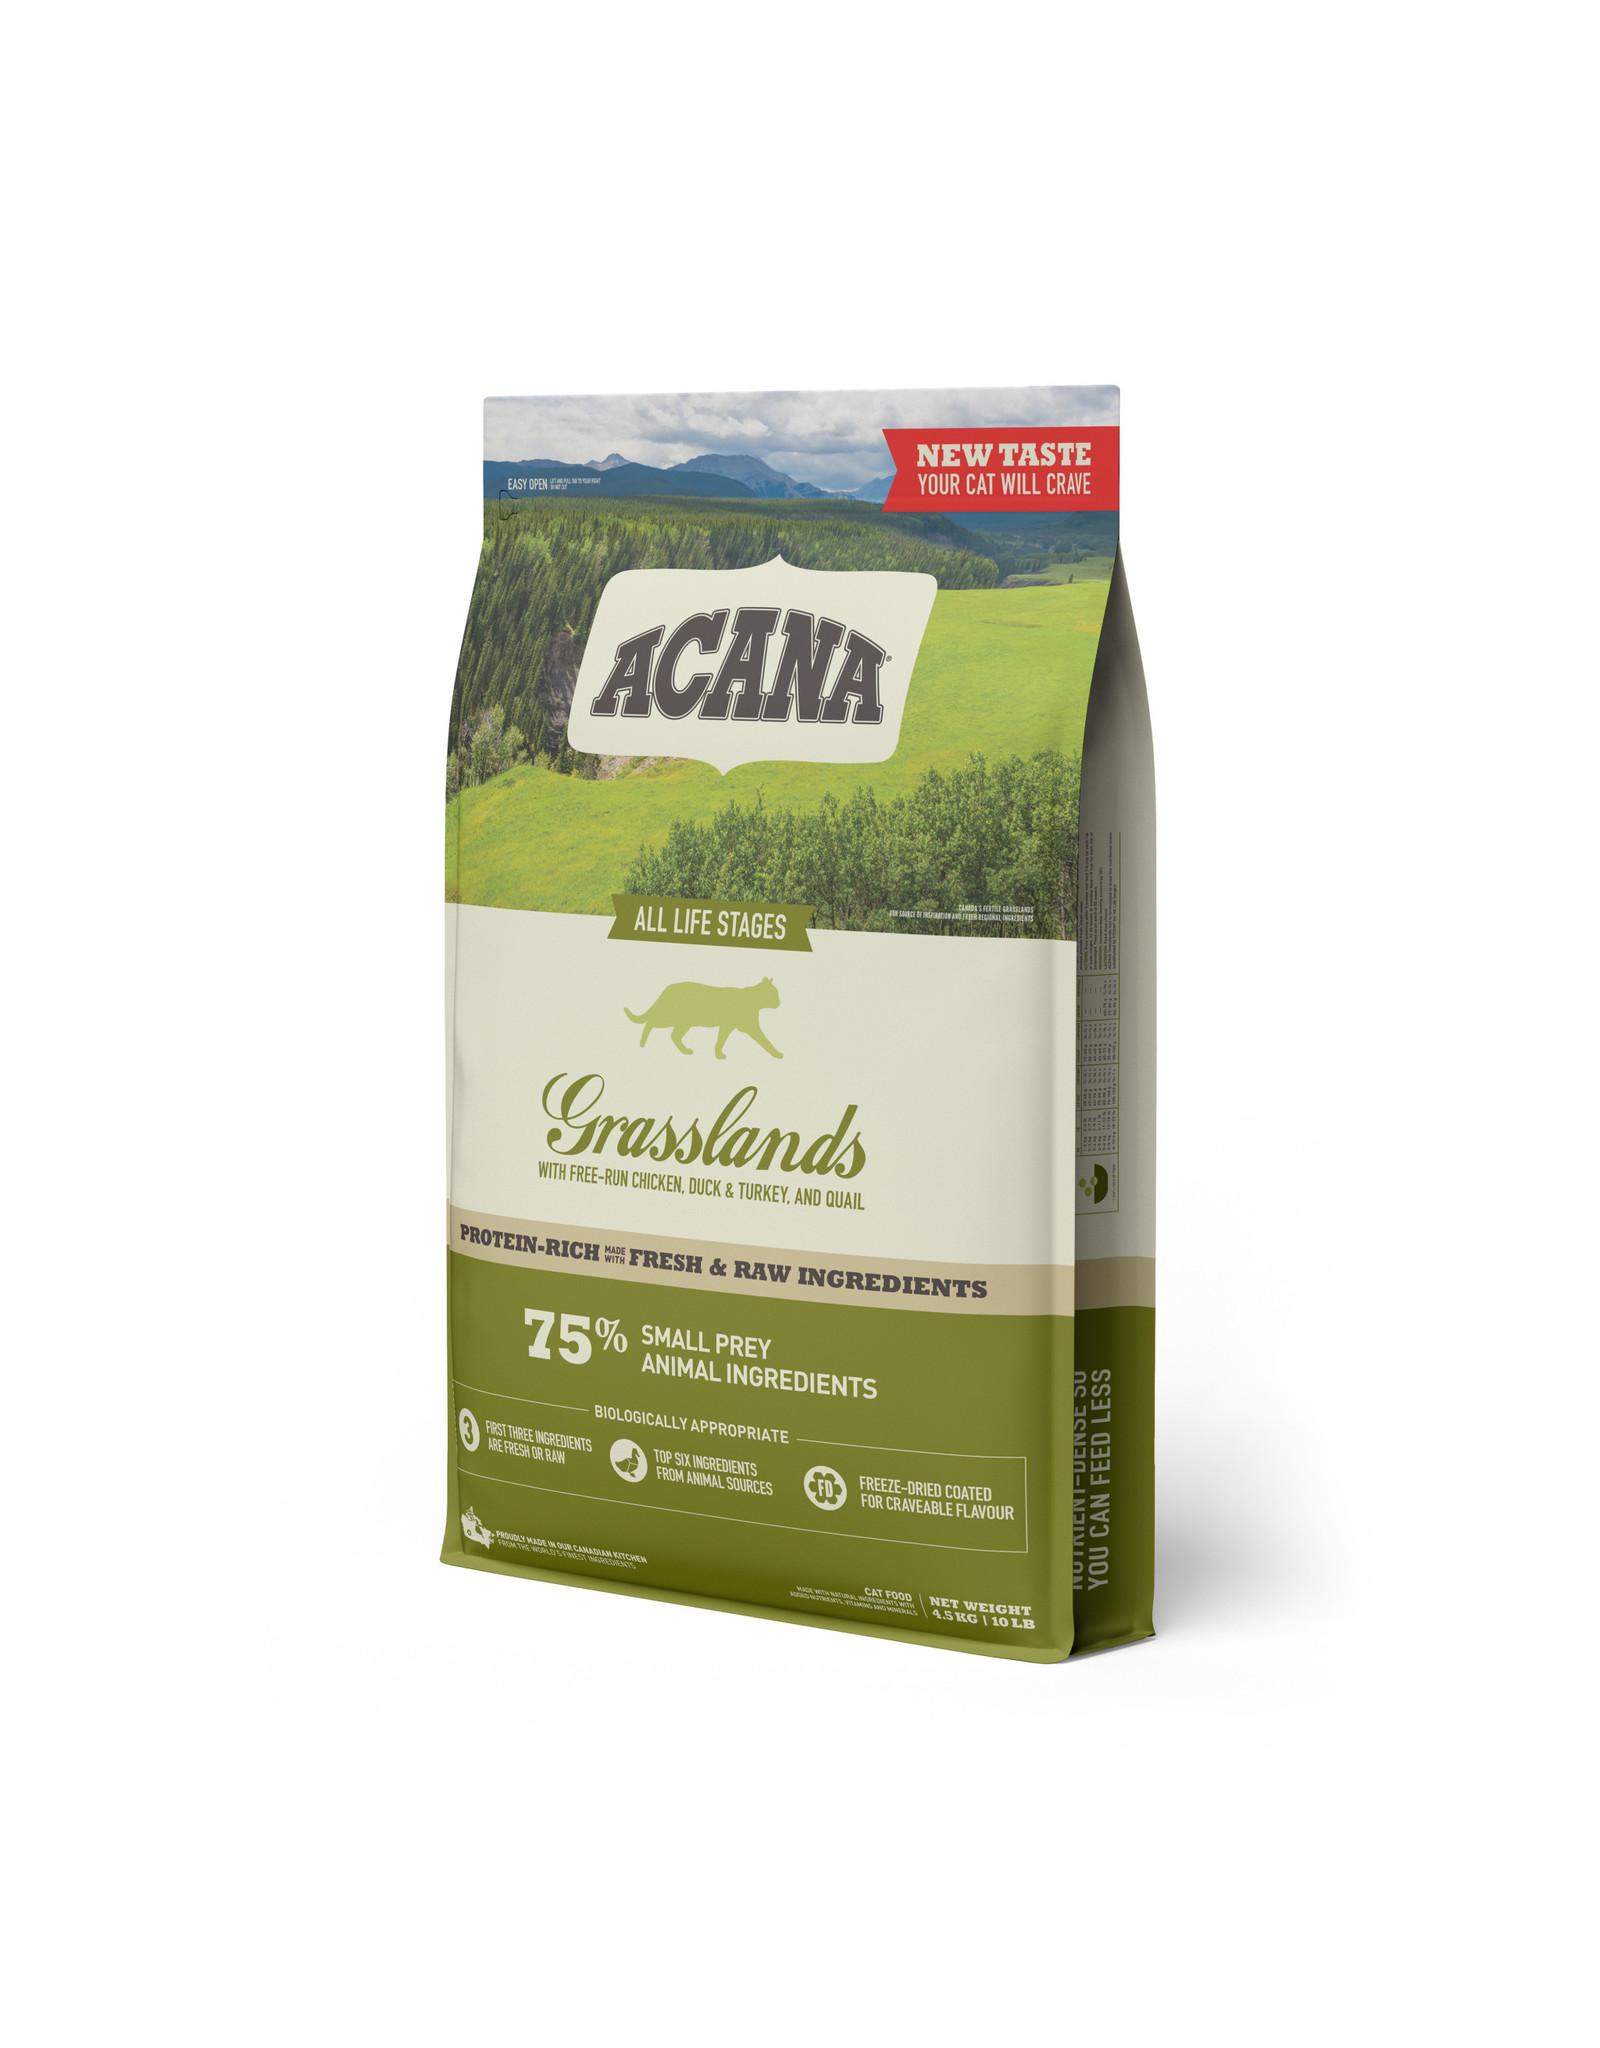 Acana Acana Grasslands [CAT]